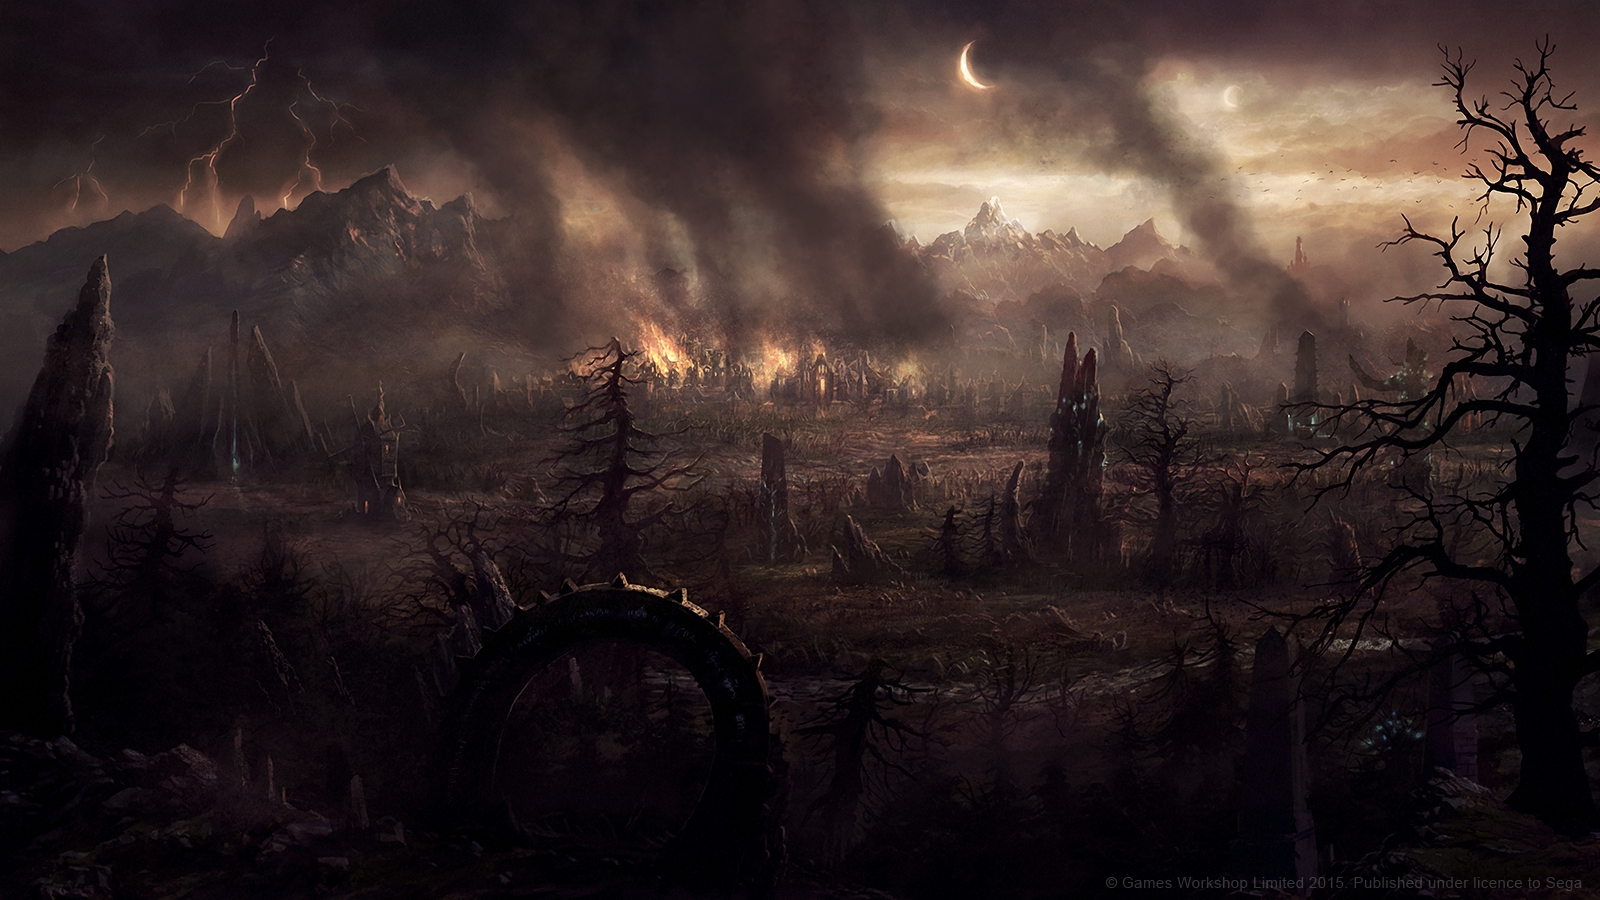 Warhammer Chaos by RadoJavor on DeviantArtWarhammer 40k Chaos Gods Fanfiction